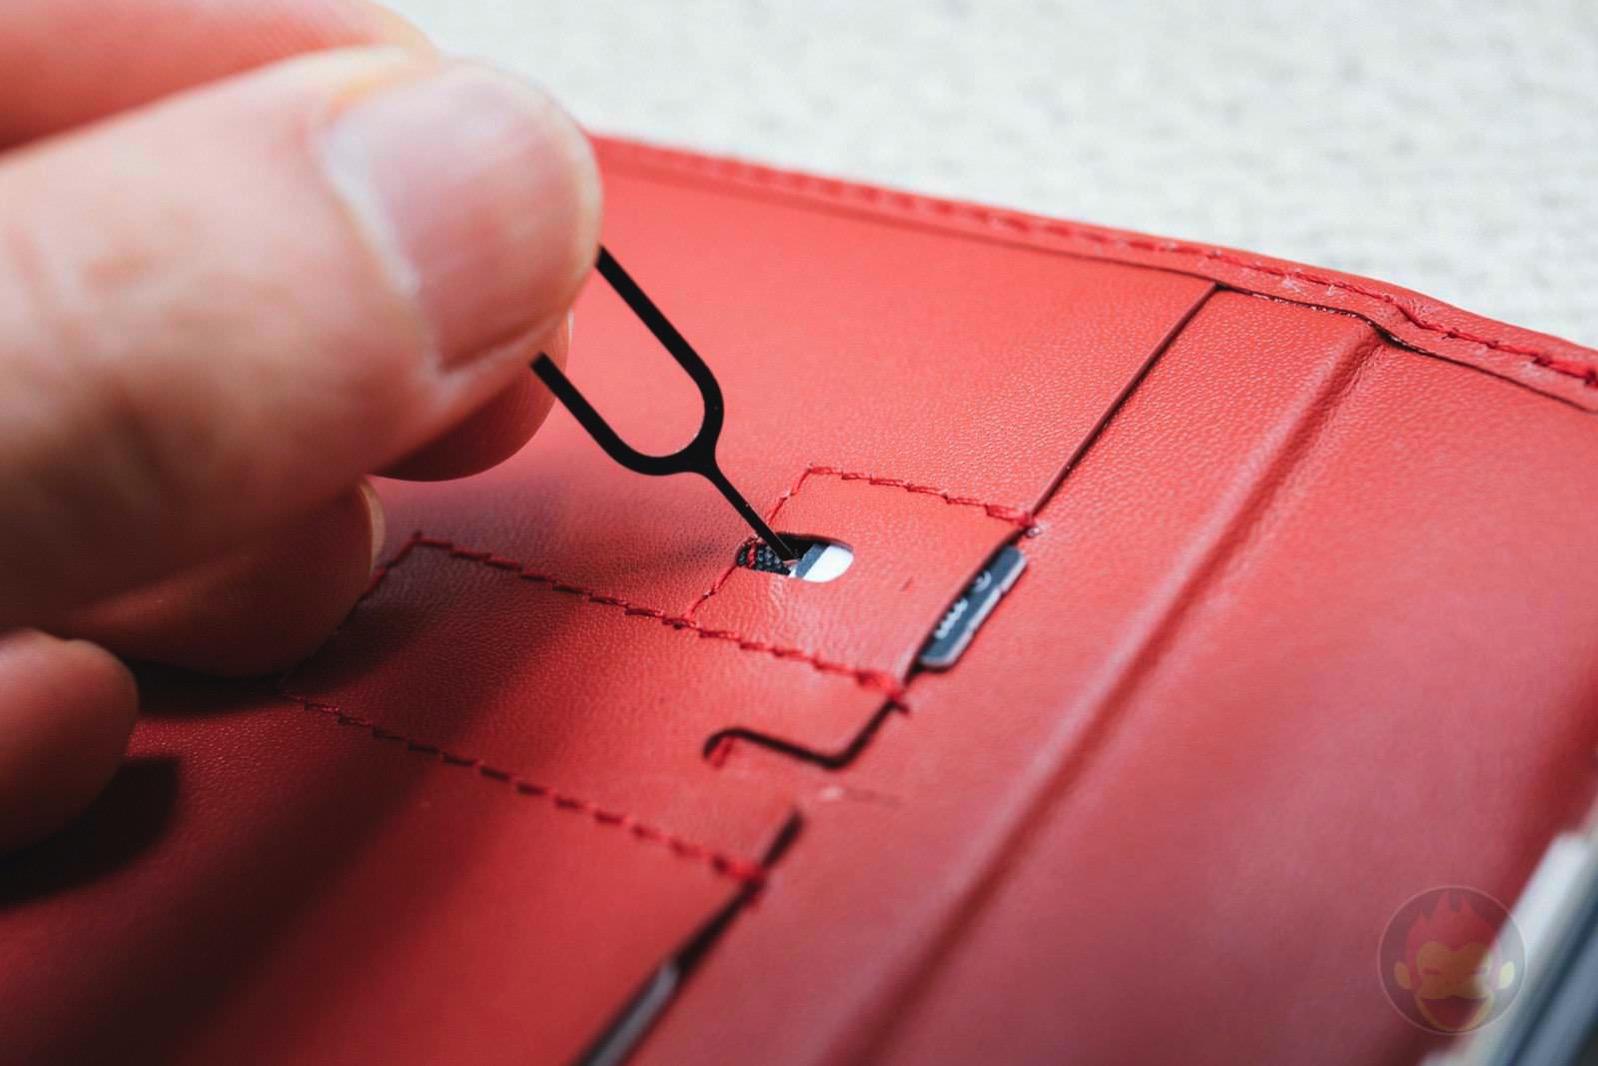 GRAMAS-Full-Leather-Case-Red-for-iPhoneX-SIM-PIN-14.jpg